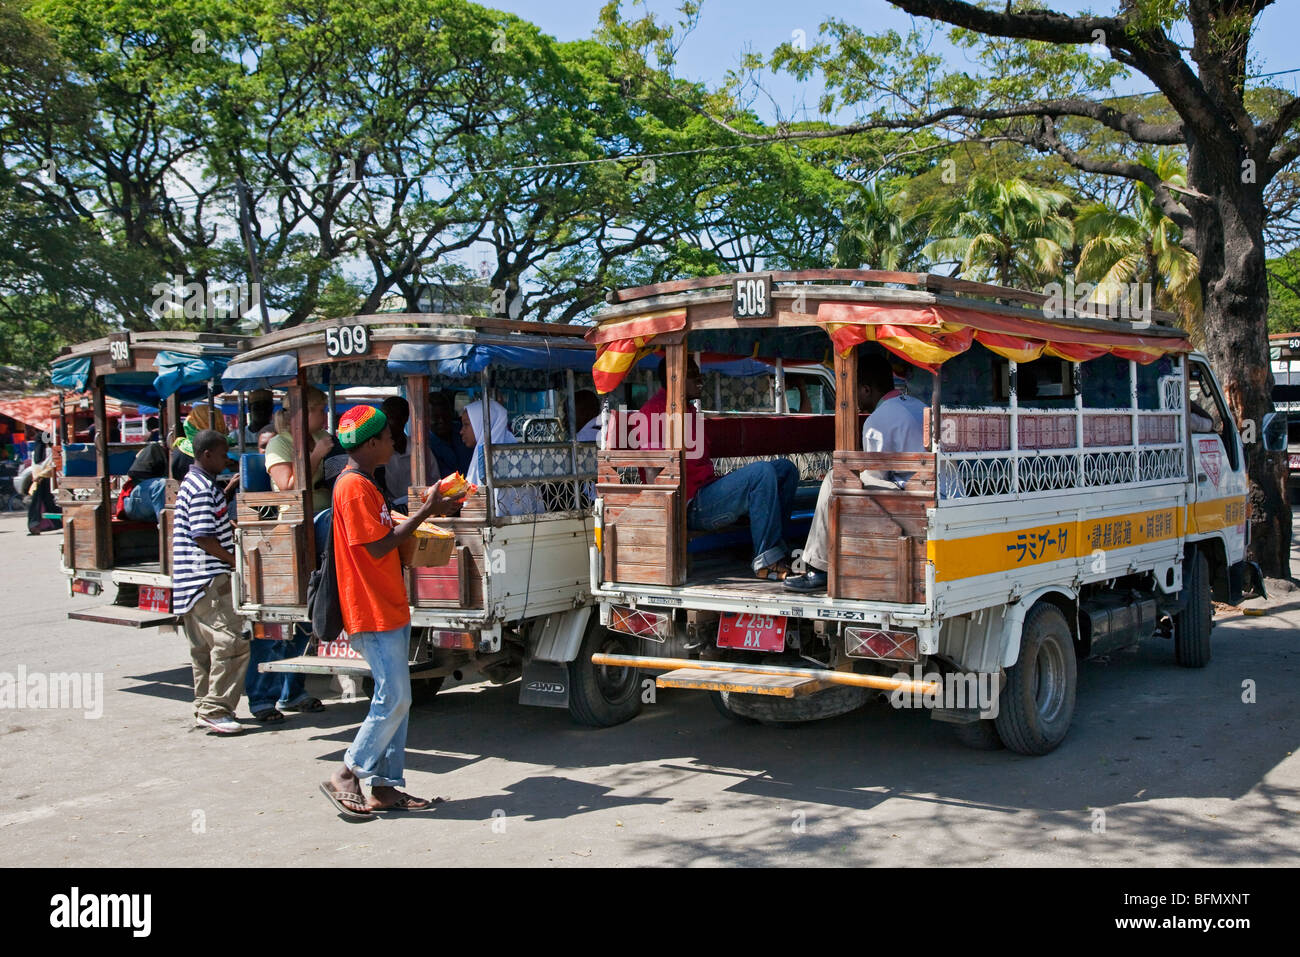 Tanzania, Zanzíbar, Stone Town. Colorido país autobuses, conocido como Daladala, línea fuera del Imagen De Stock